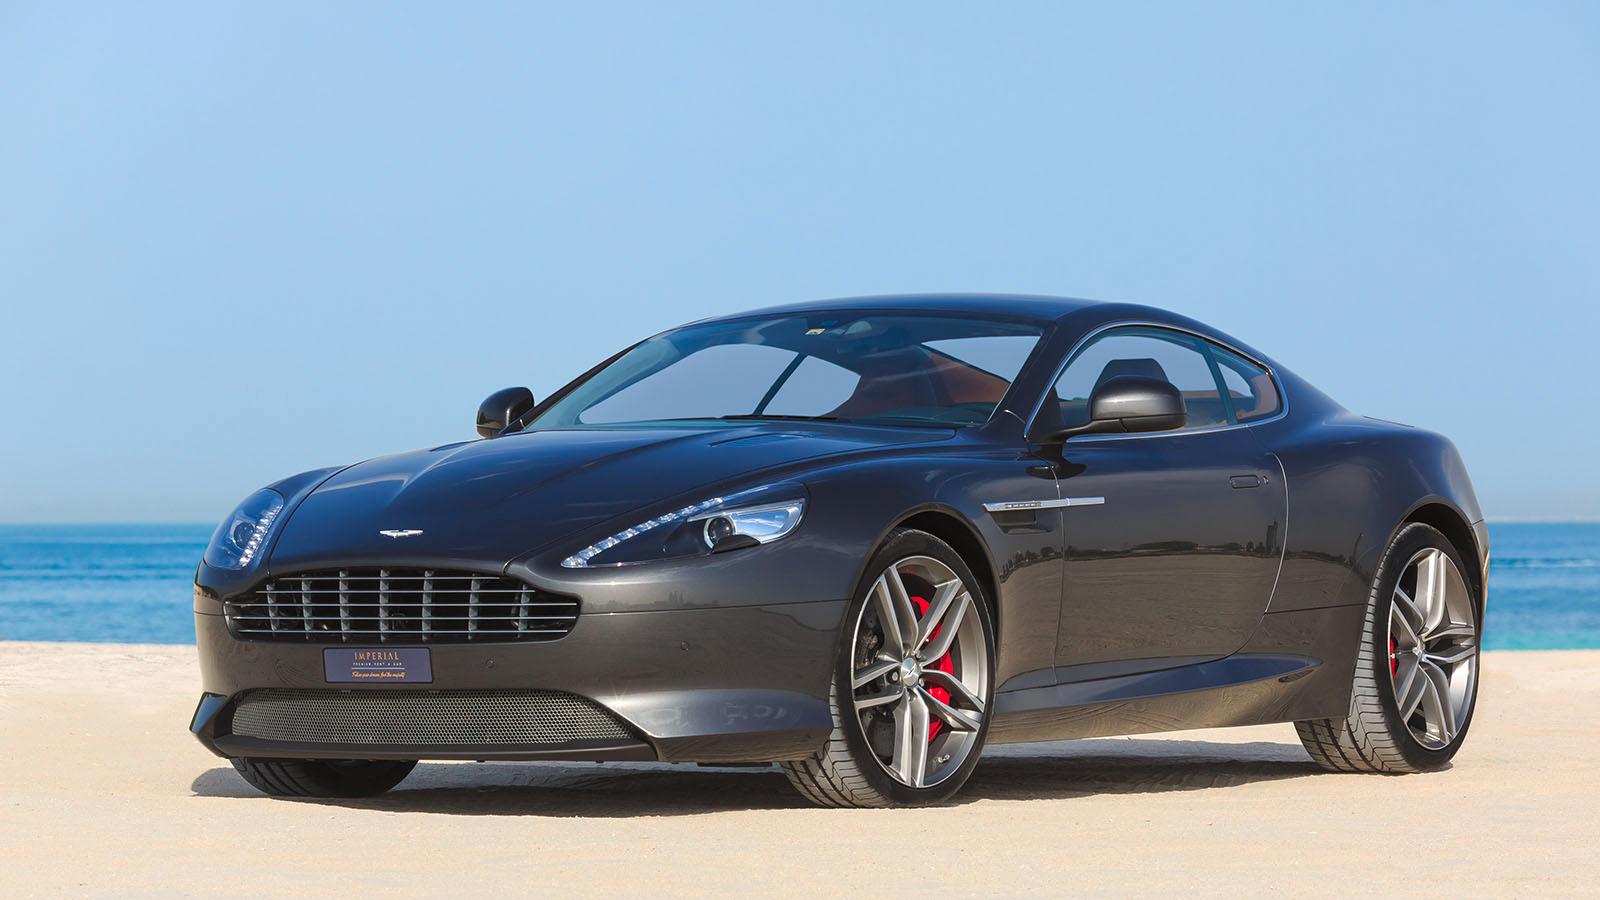 Aston Martin Db9 Rent Dubai